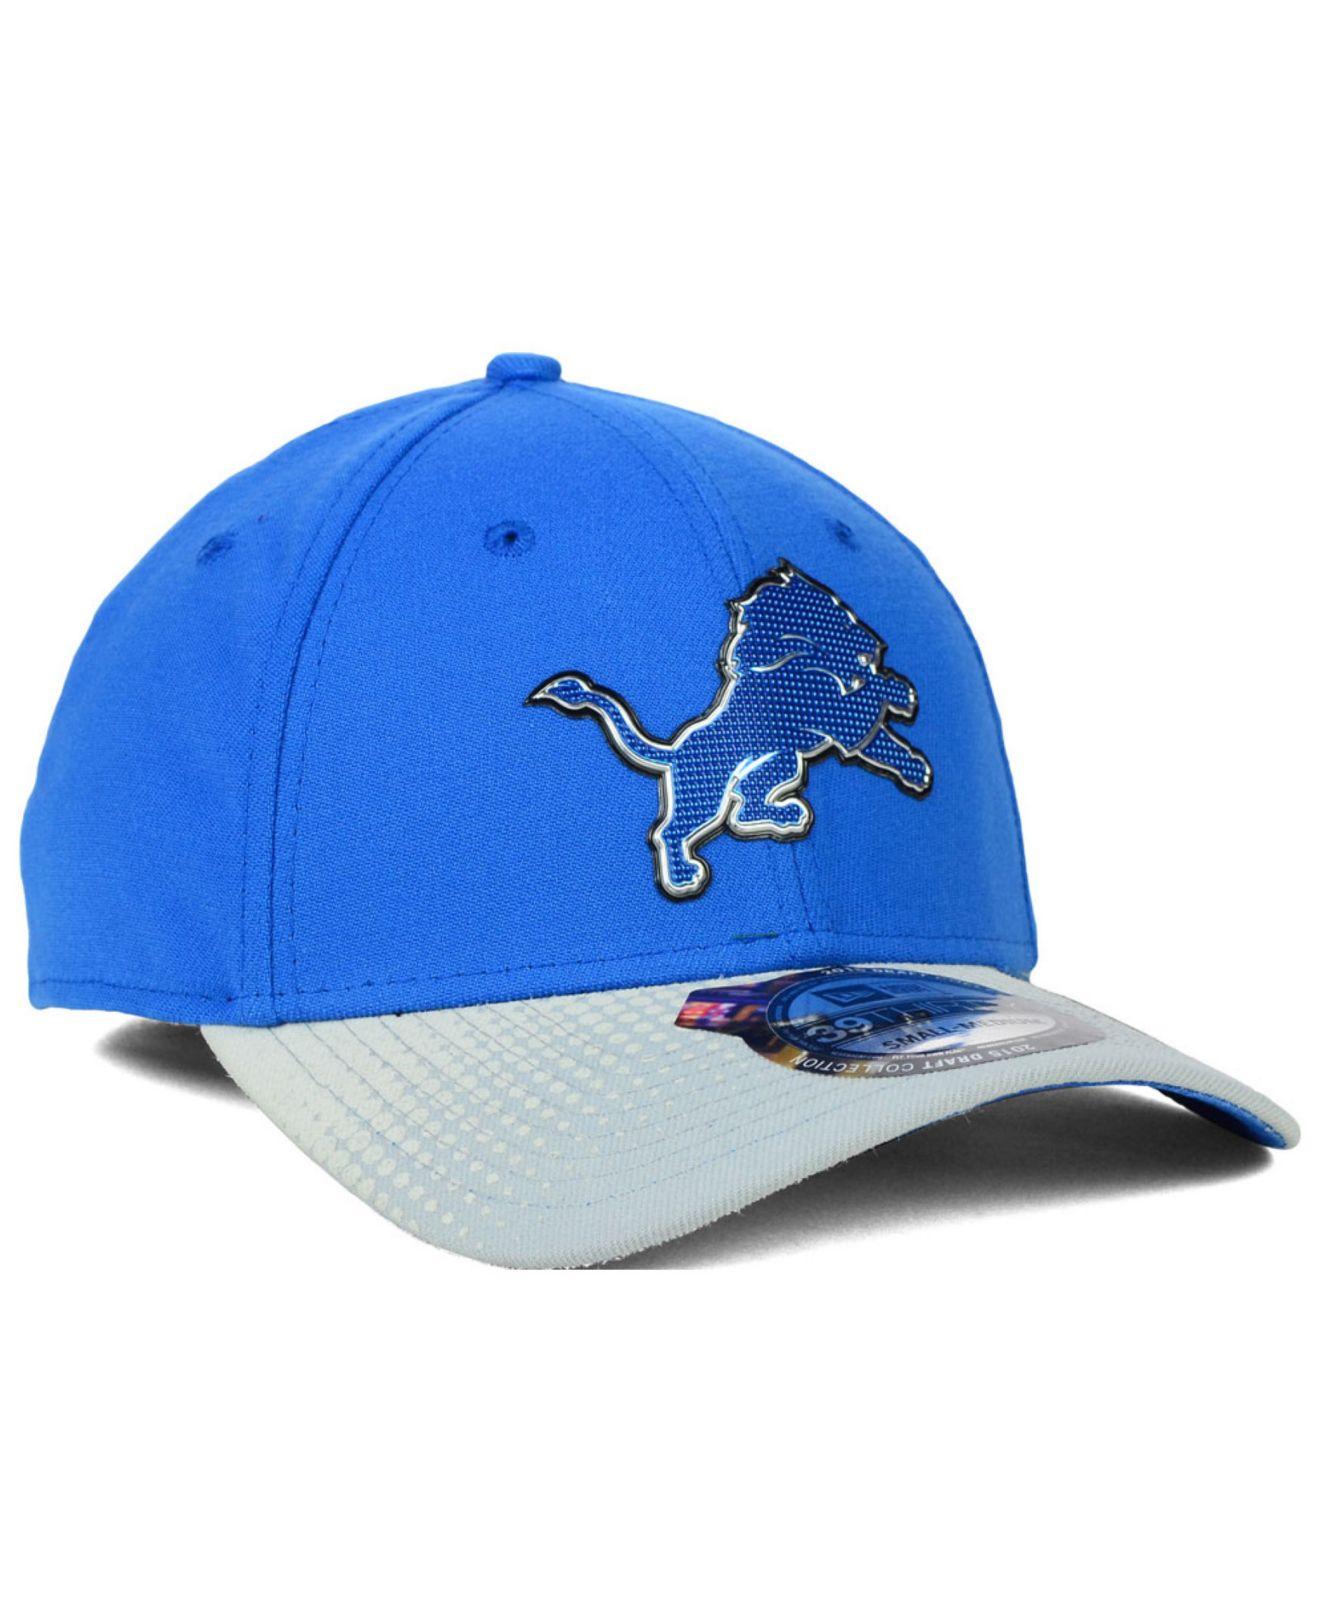 366a7e48 new zealand detroit lions draft hat 2015 df824 05d78